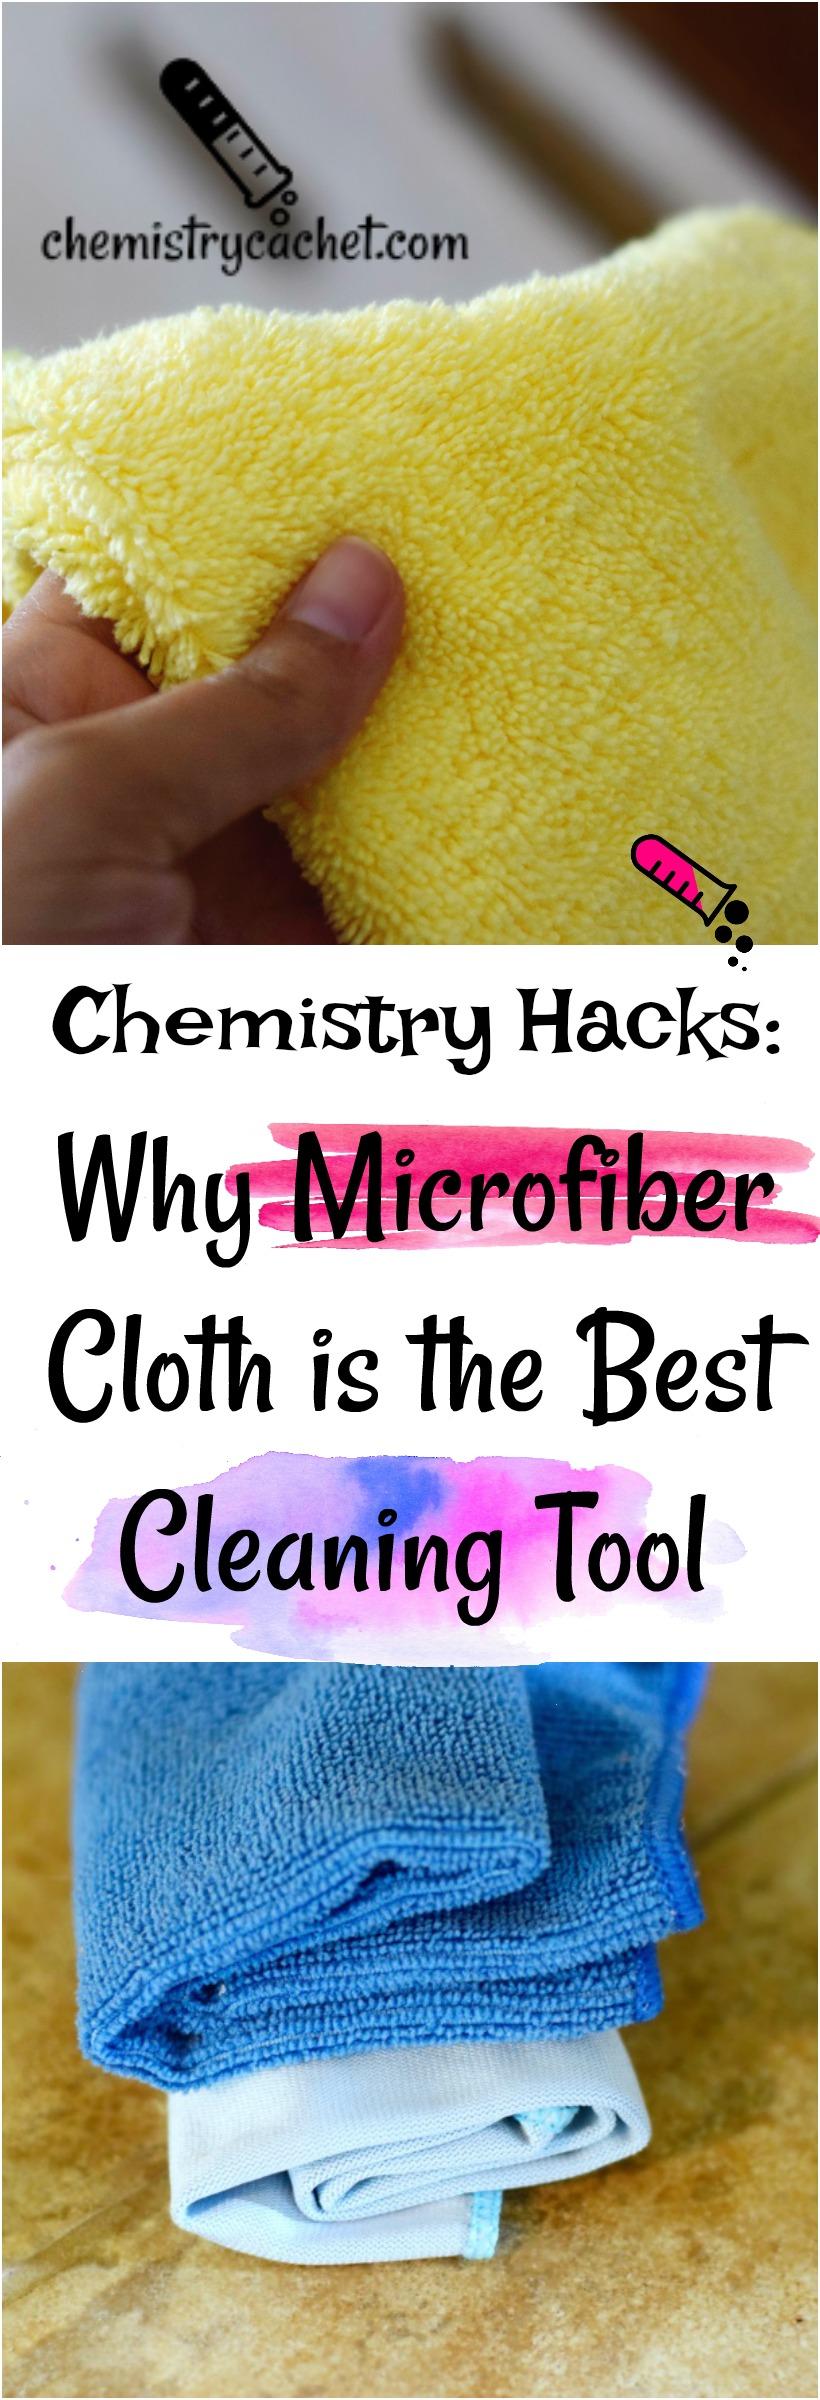 Chemistry Hacks why microfiber cloth is the best cleaning tool. Microfiber cleaning tips on chemistrycachet.com